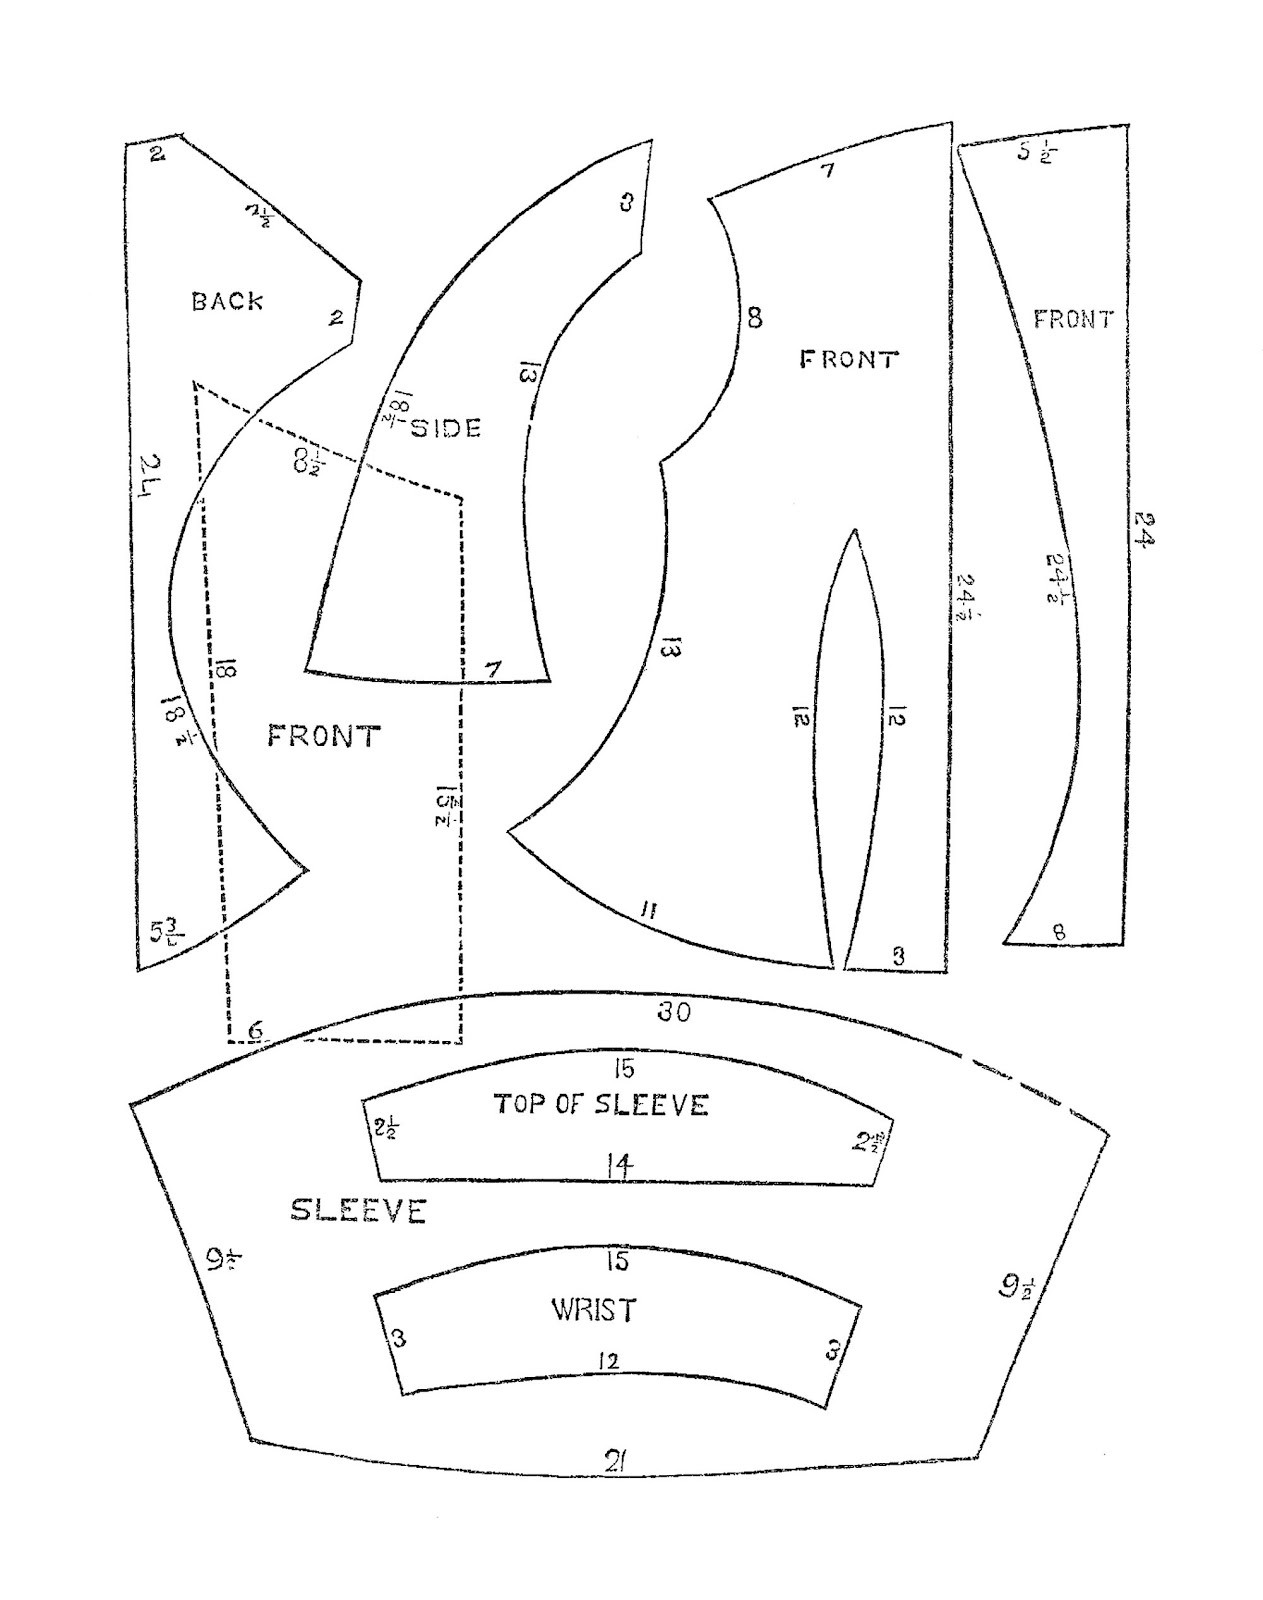 Antique Images: Free Antique Sewing Graphic: Victorian Era